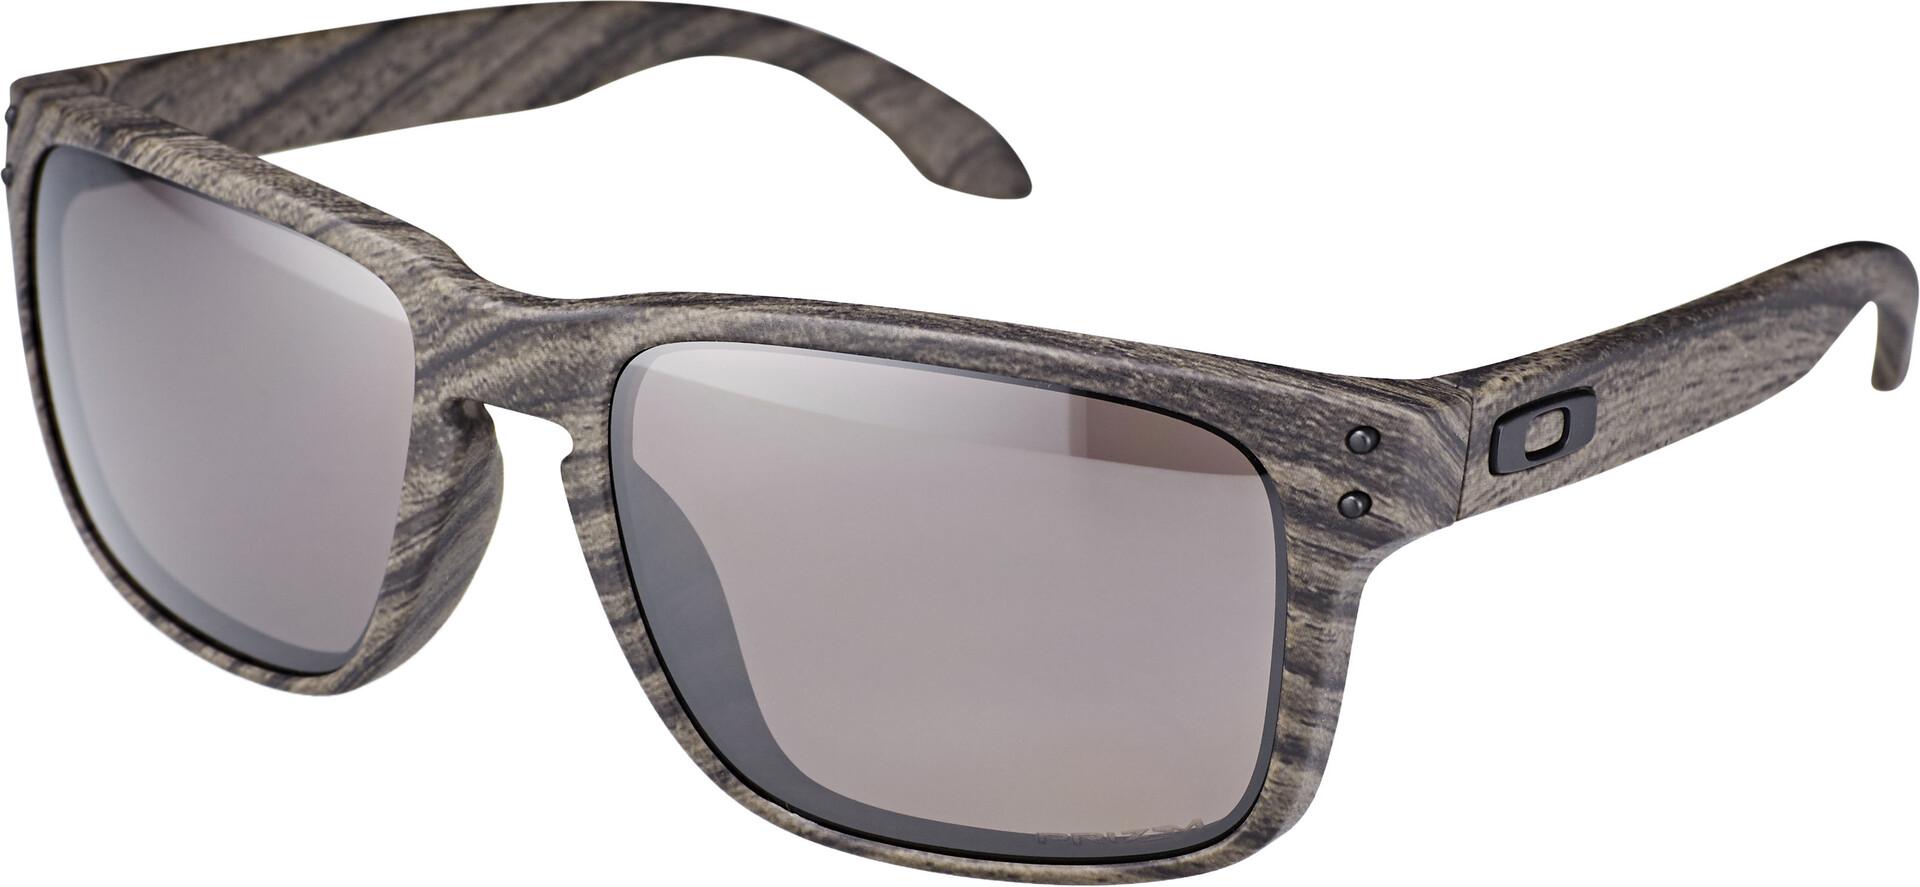 619a221b84d shopping oakley holbrook bike glasses orange black a8a00 7c19b